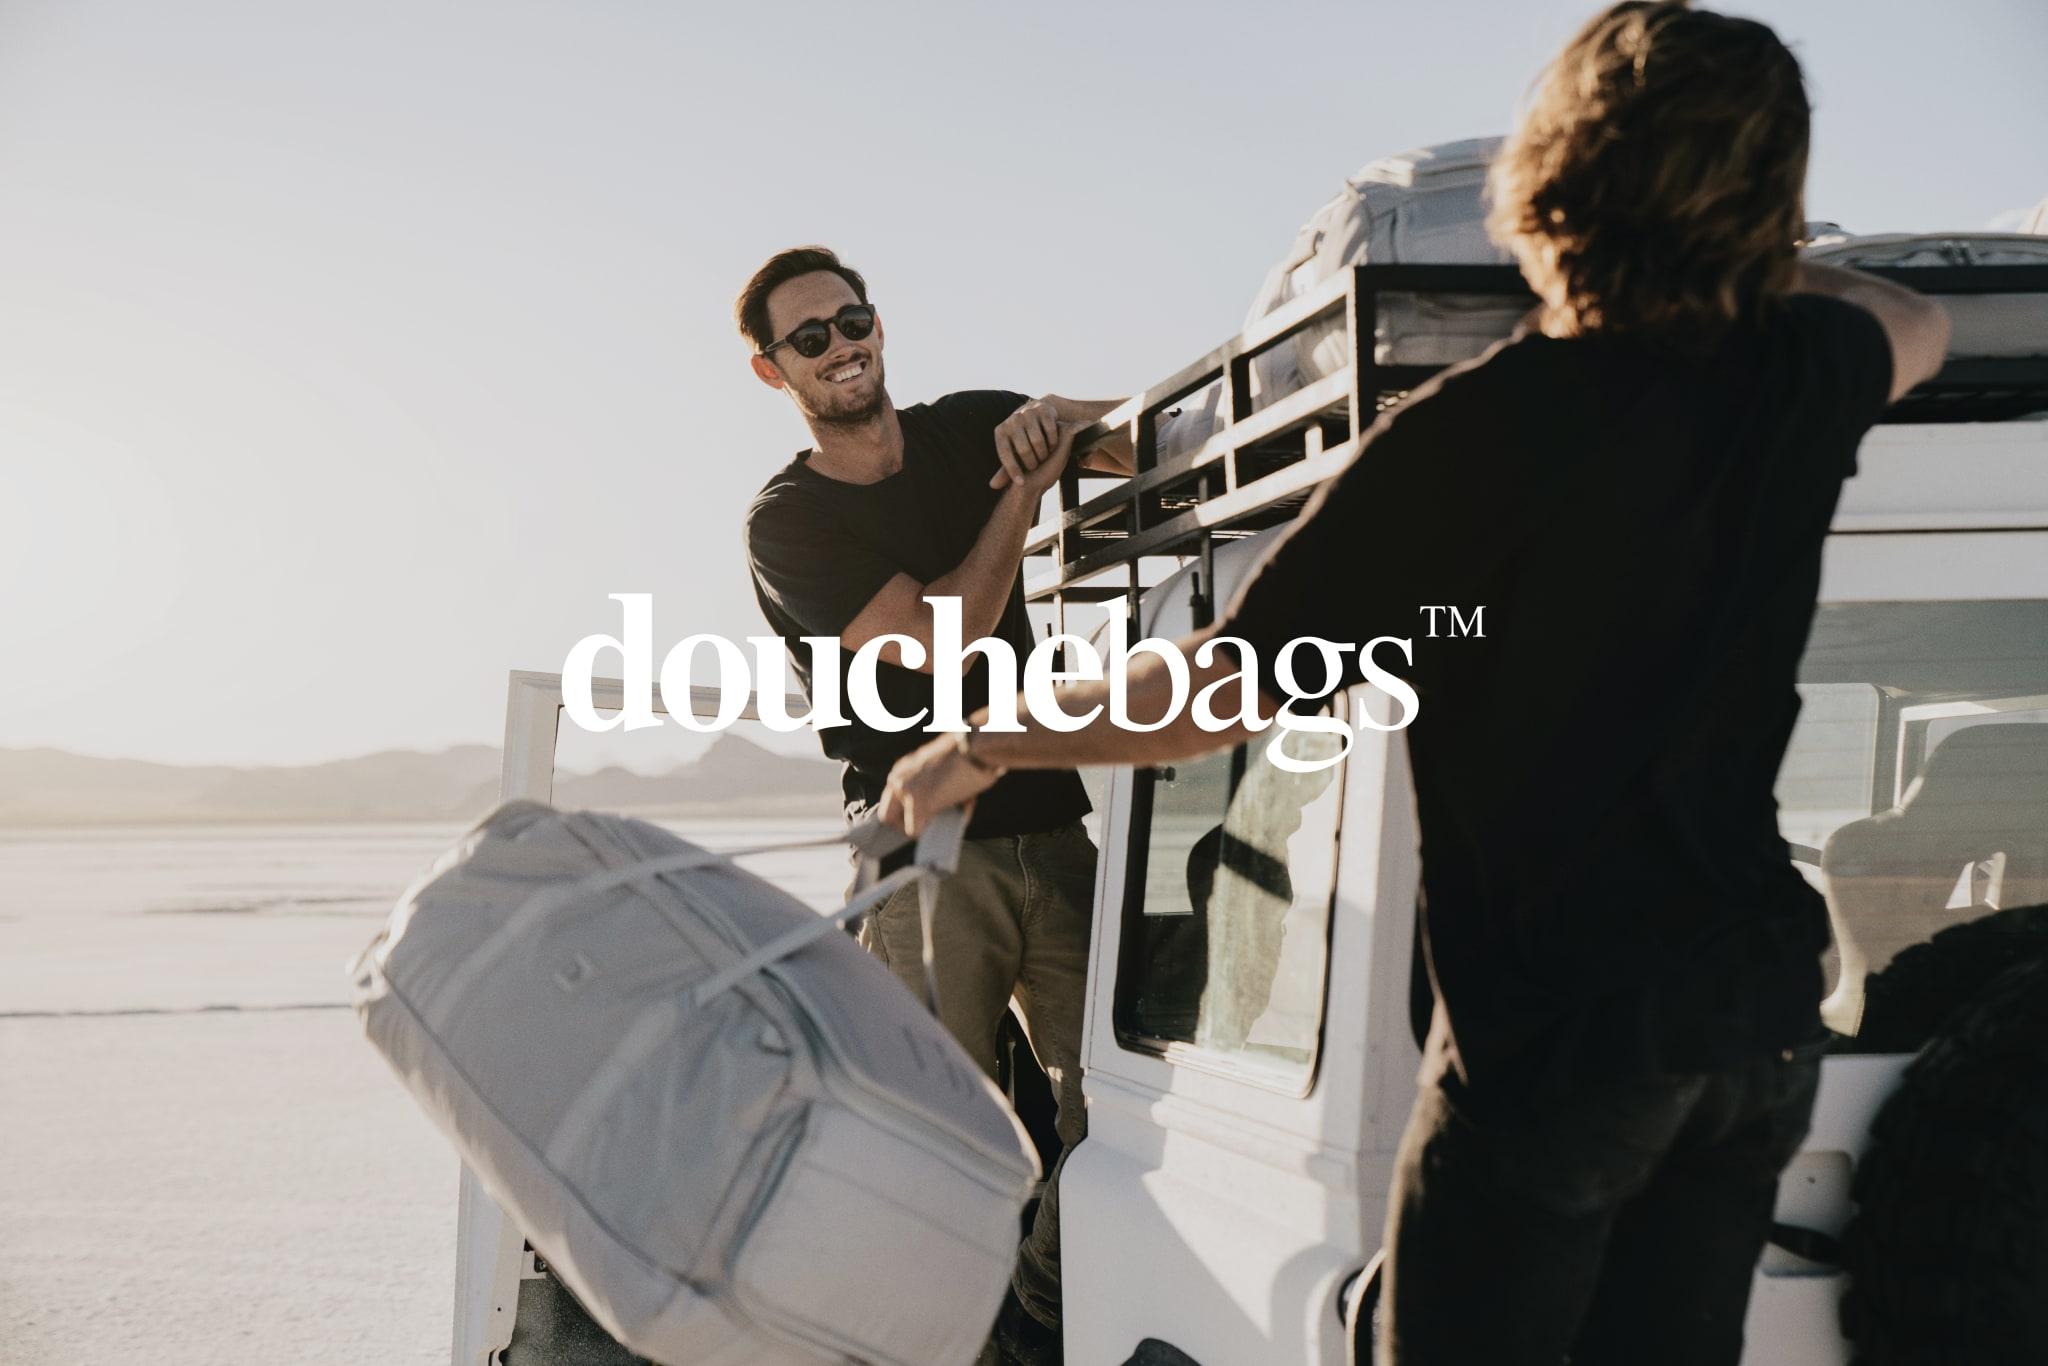 DouchSS19